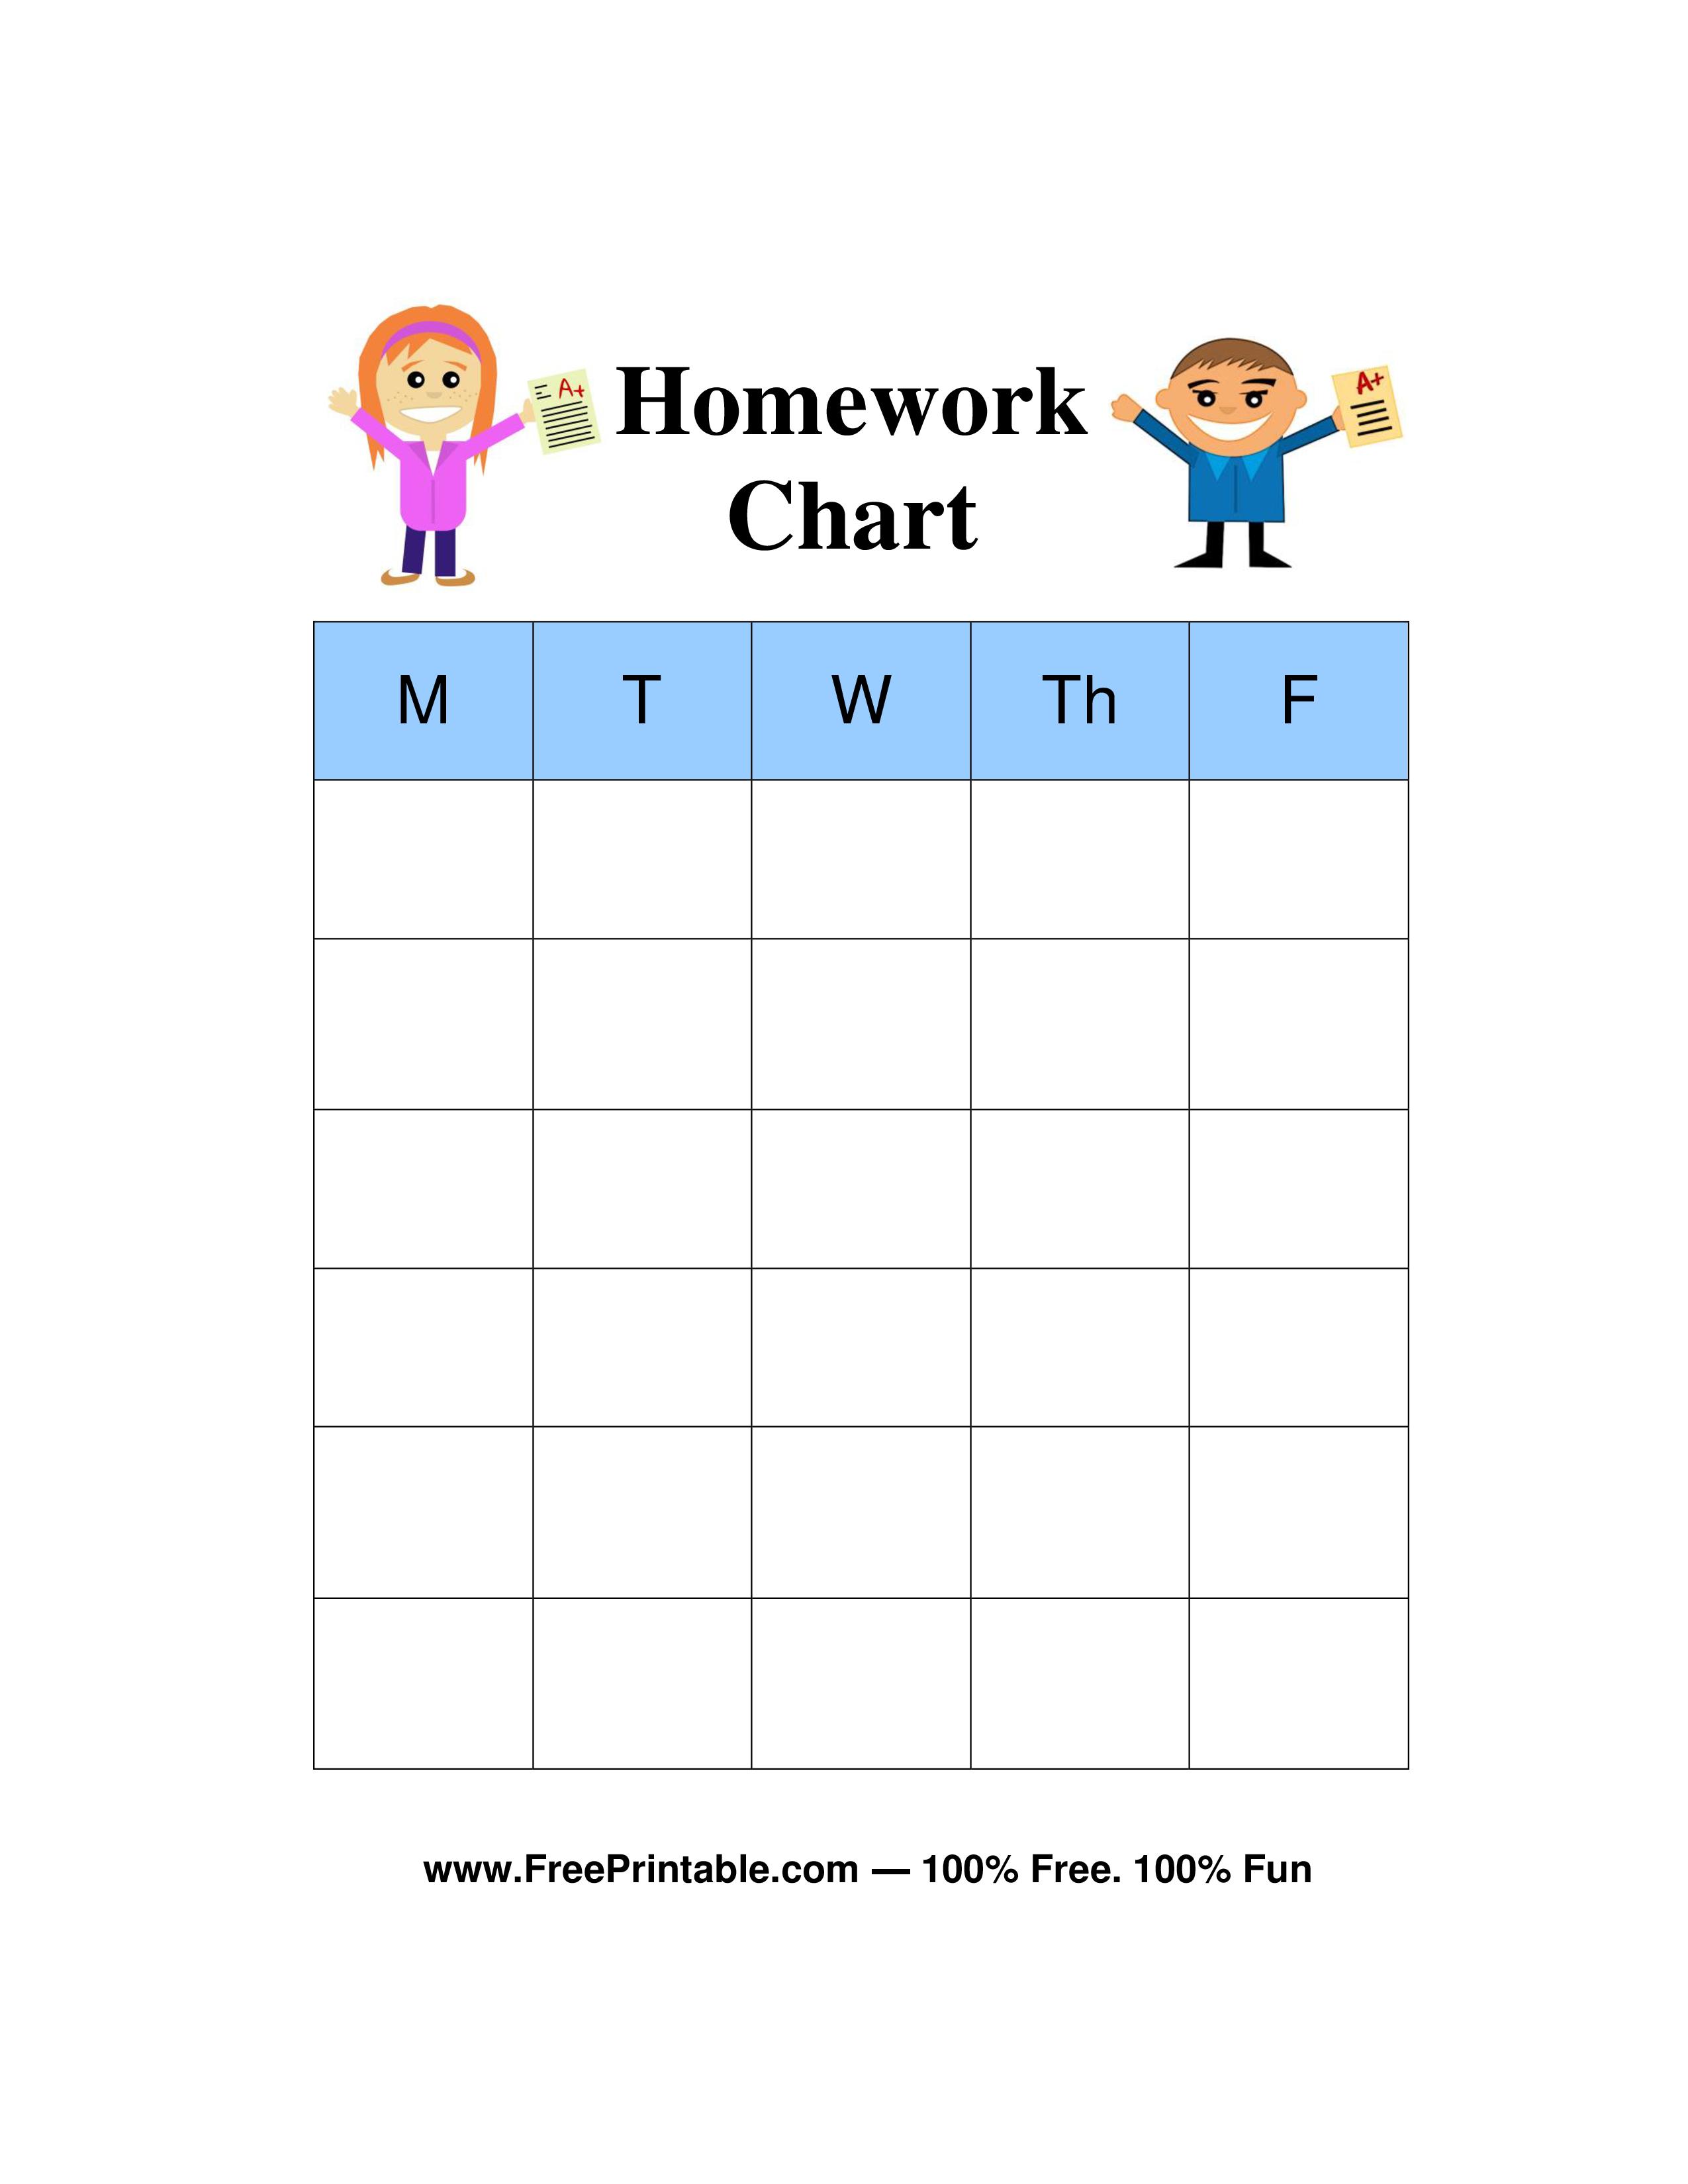 HD wallpapers printable weekly chore chart